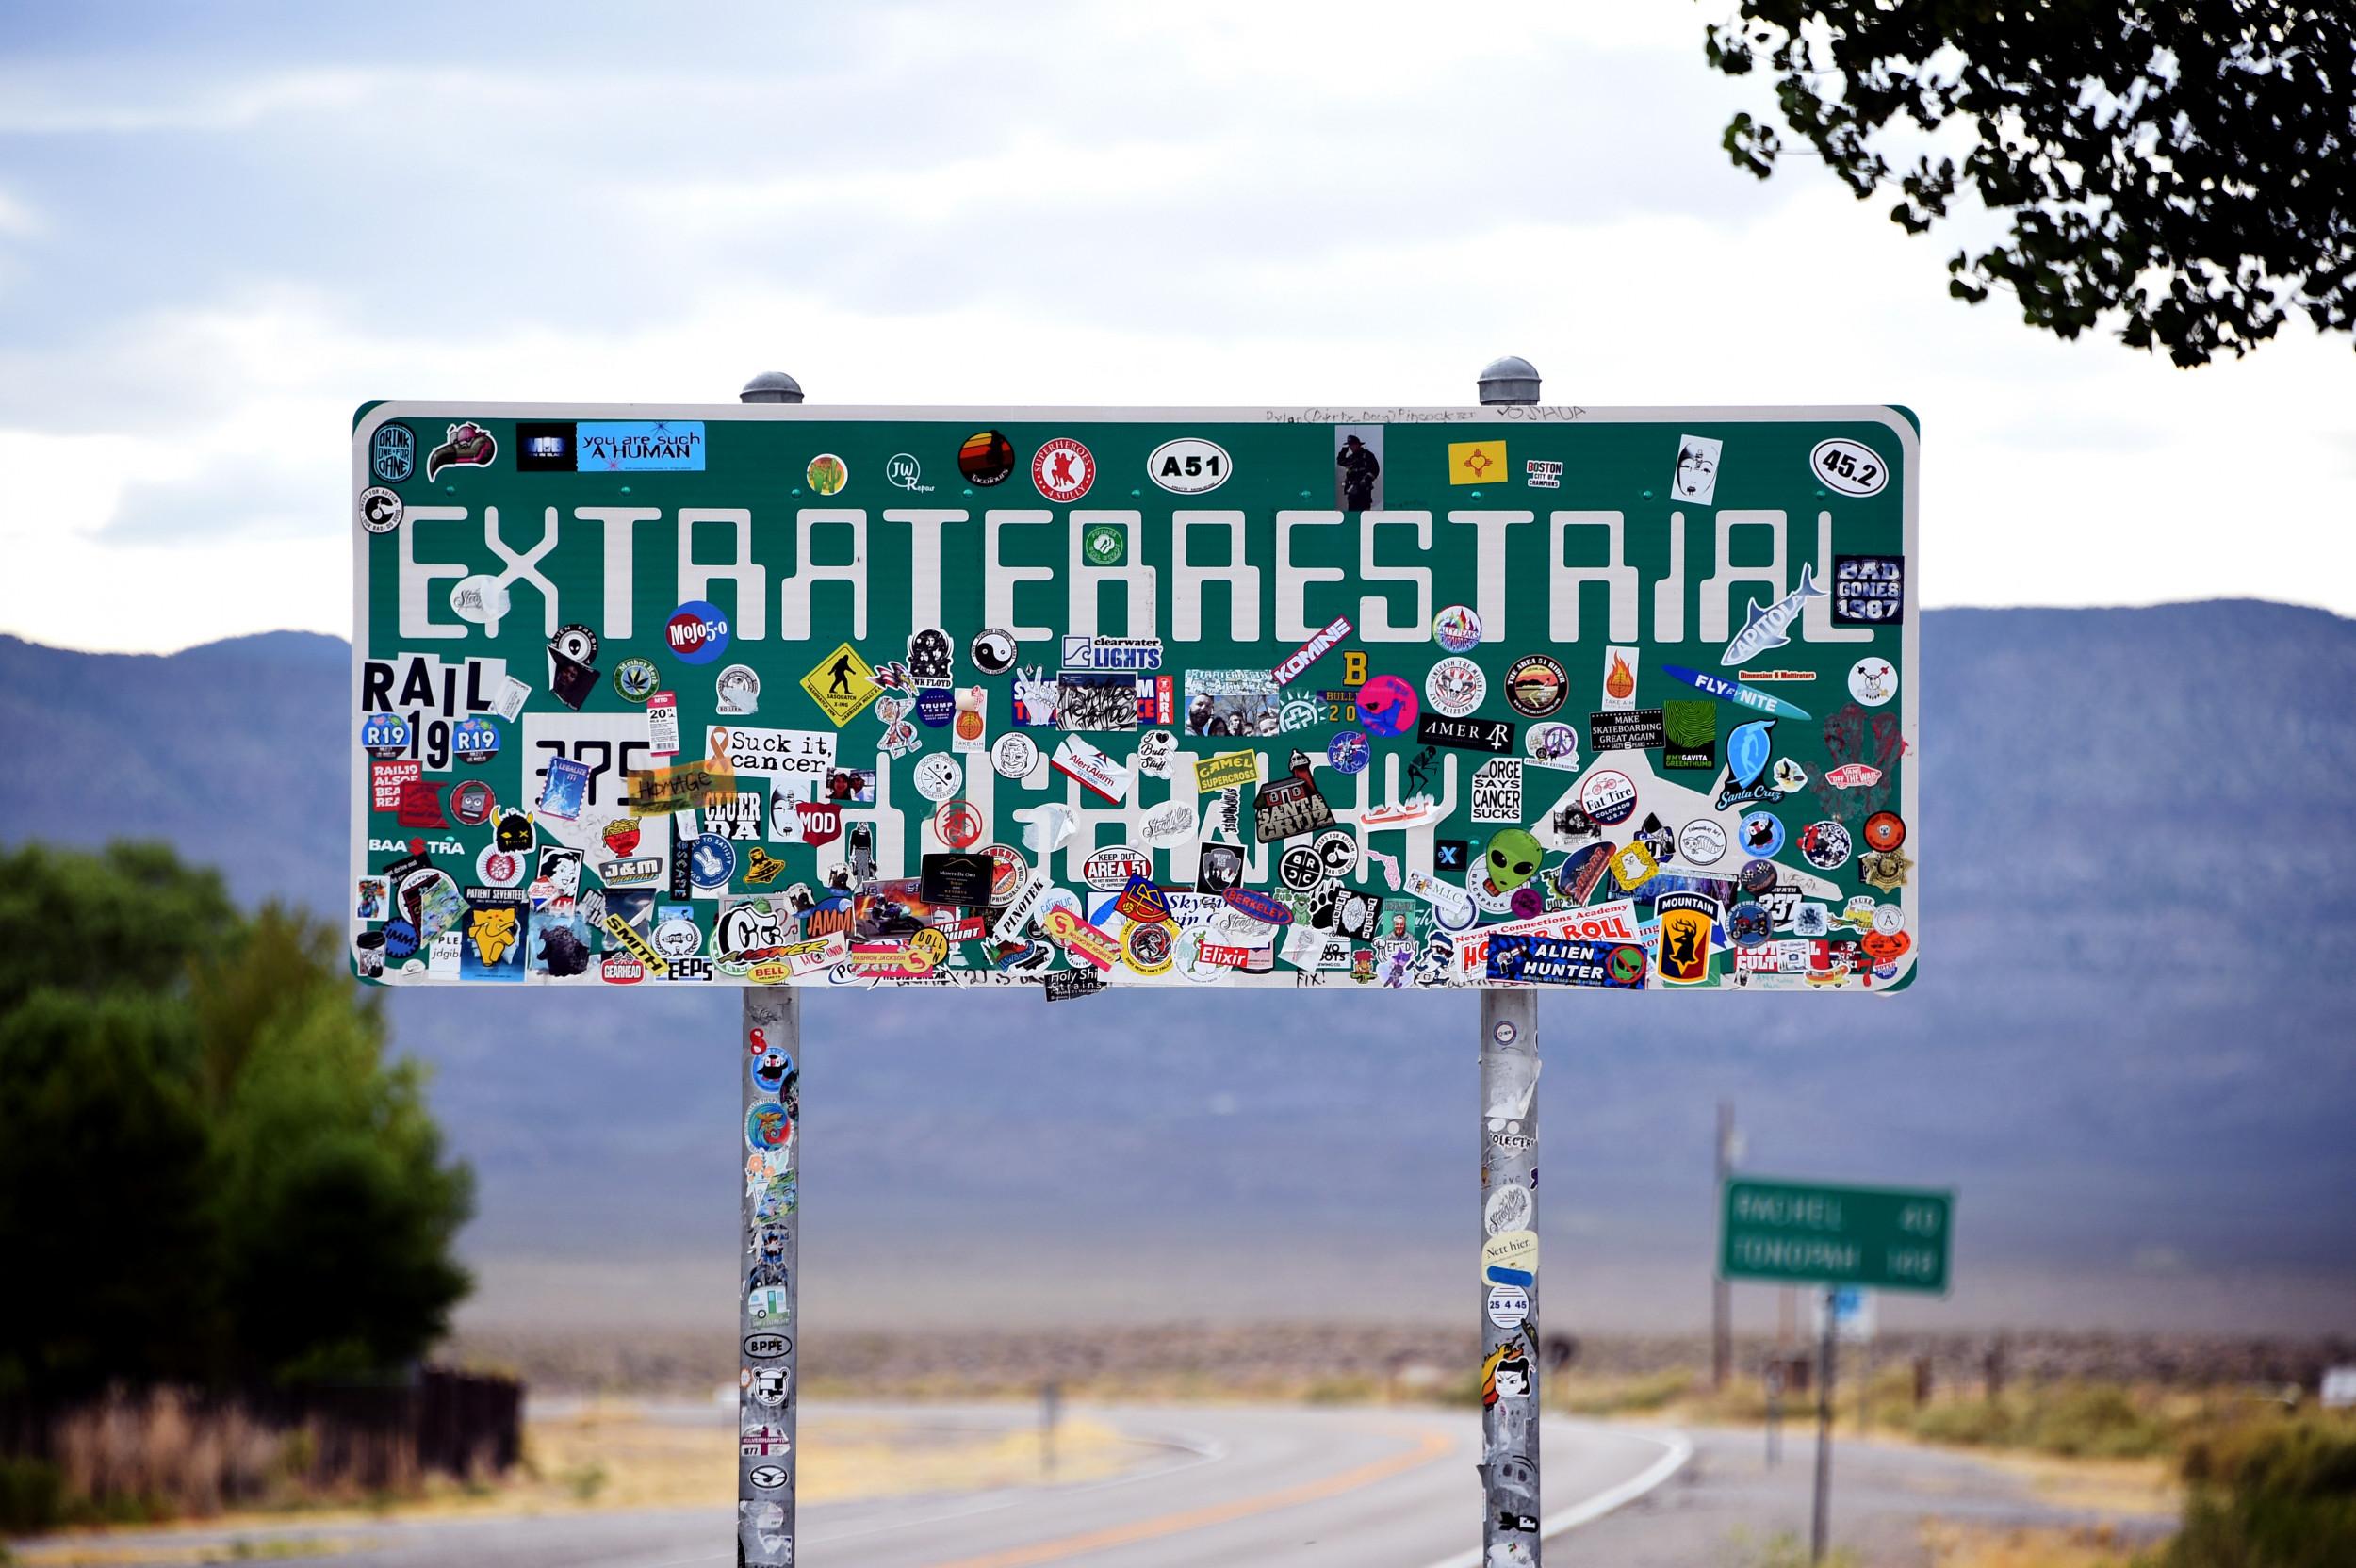 The Area 51 Meme Isn't A Joke Anymore, It's A Cultural